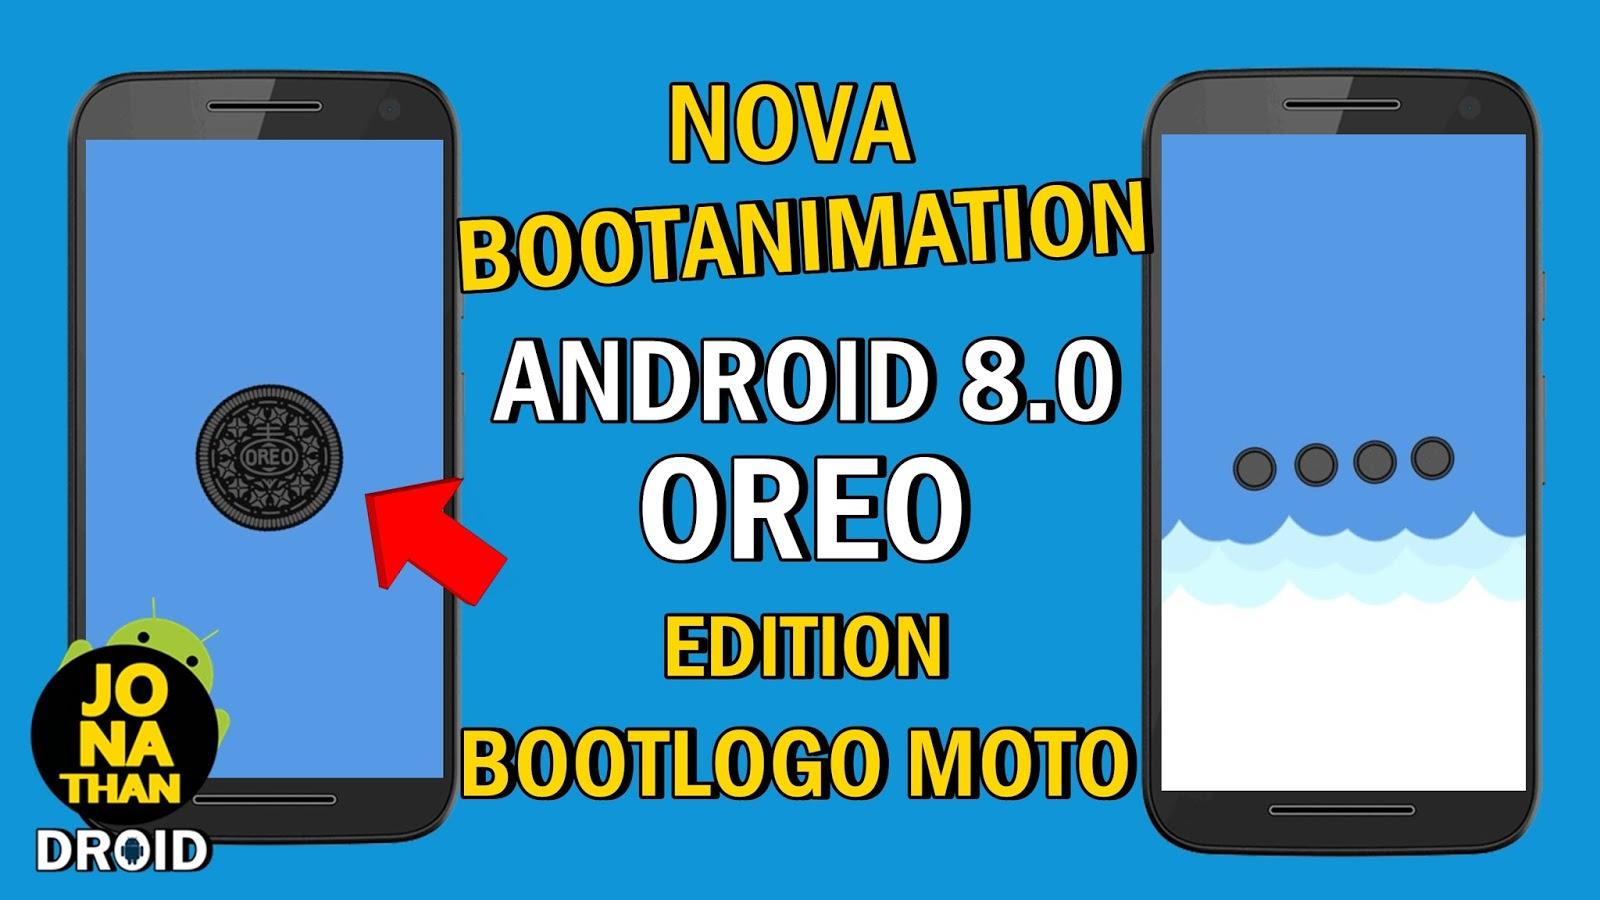 SAIU: Nova Bootanimation Android Oreo 8 0 Edition & Bootlogo